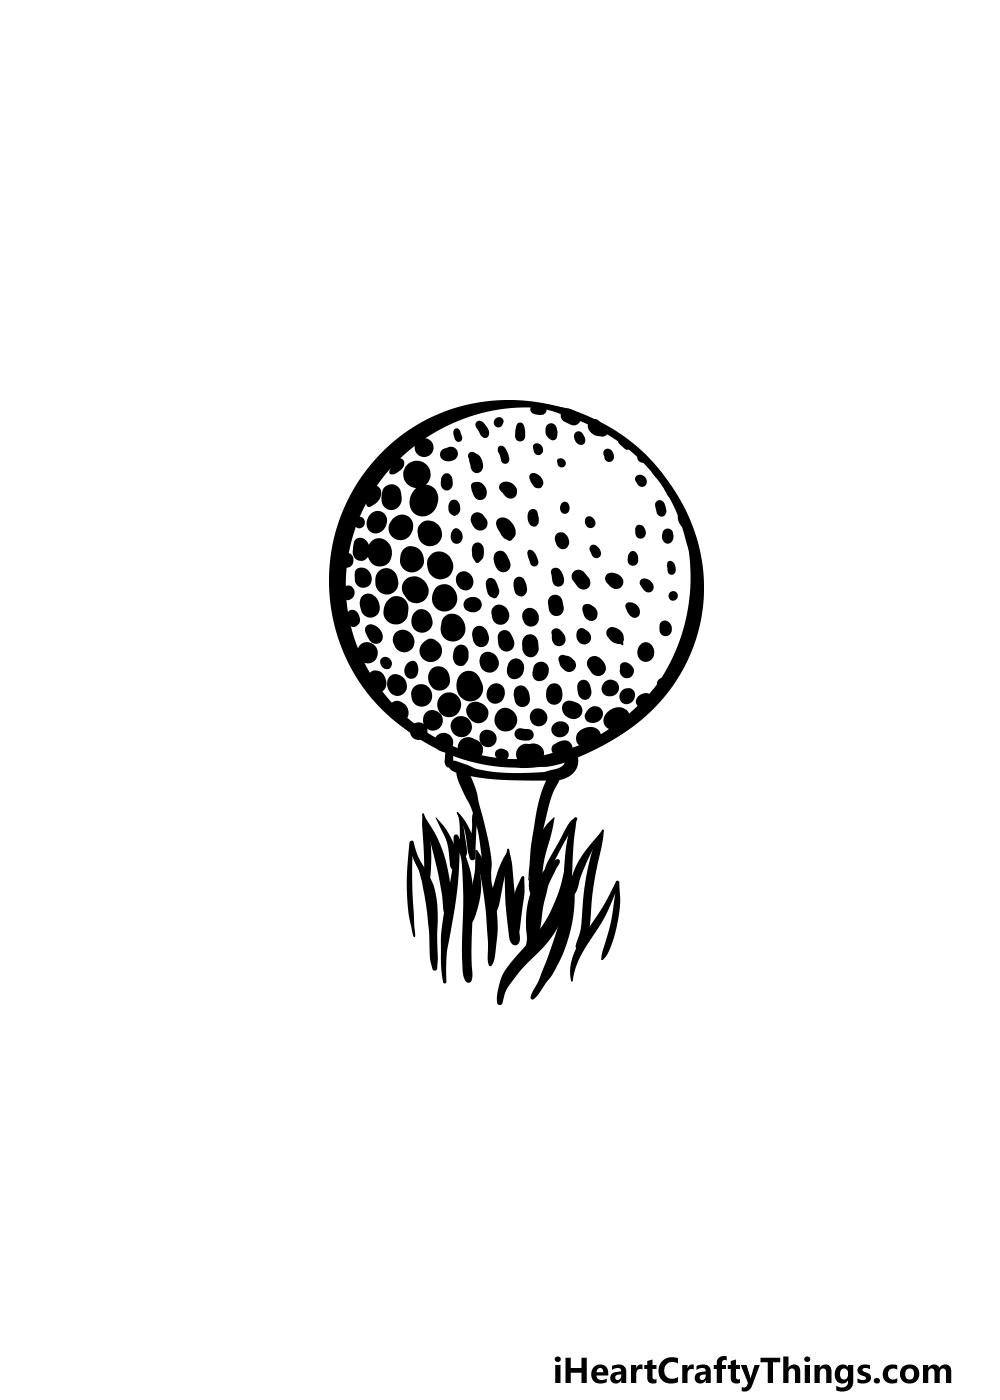 drawing a golf ball step 6